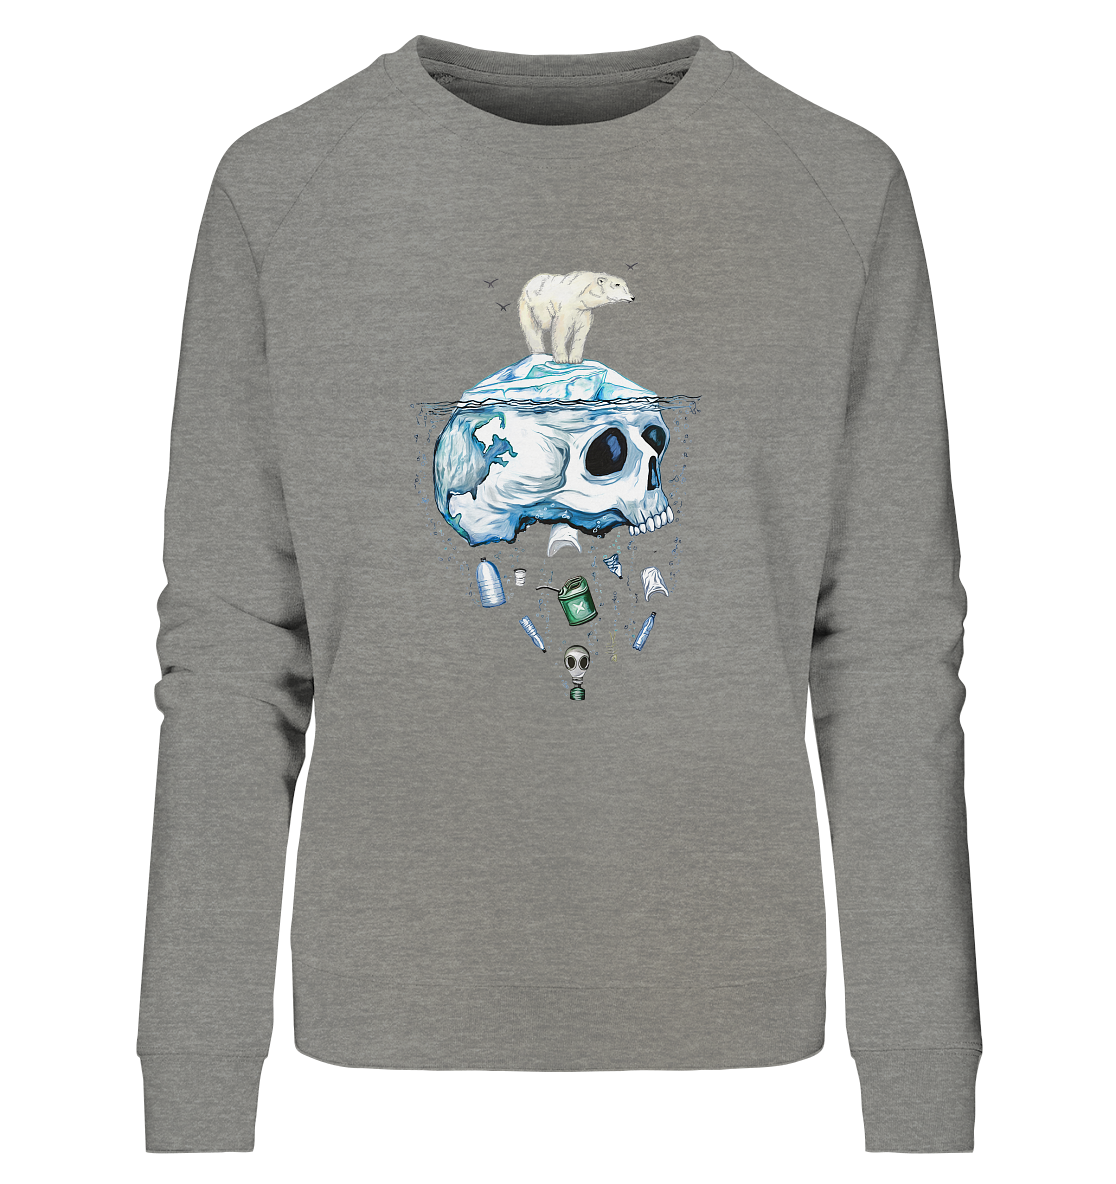 front-ladies-organic-sweatshirt-818381-1116x.png